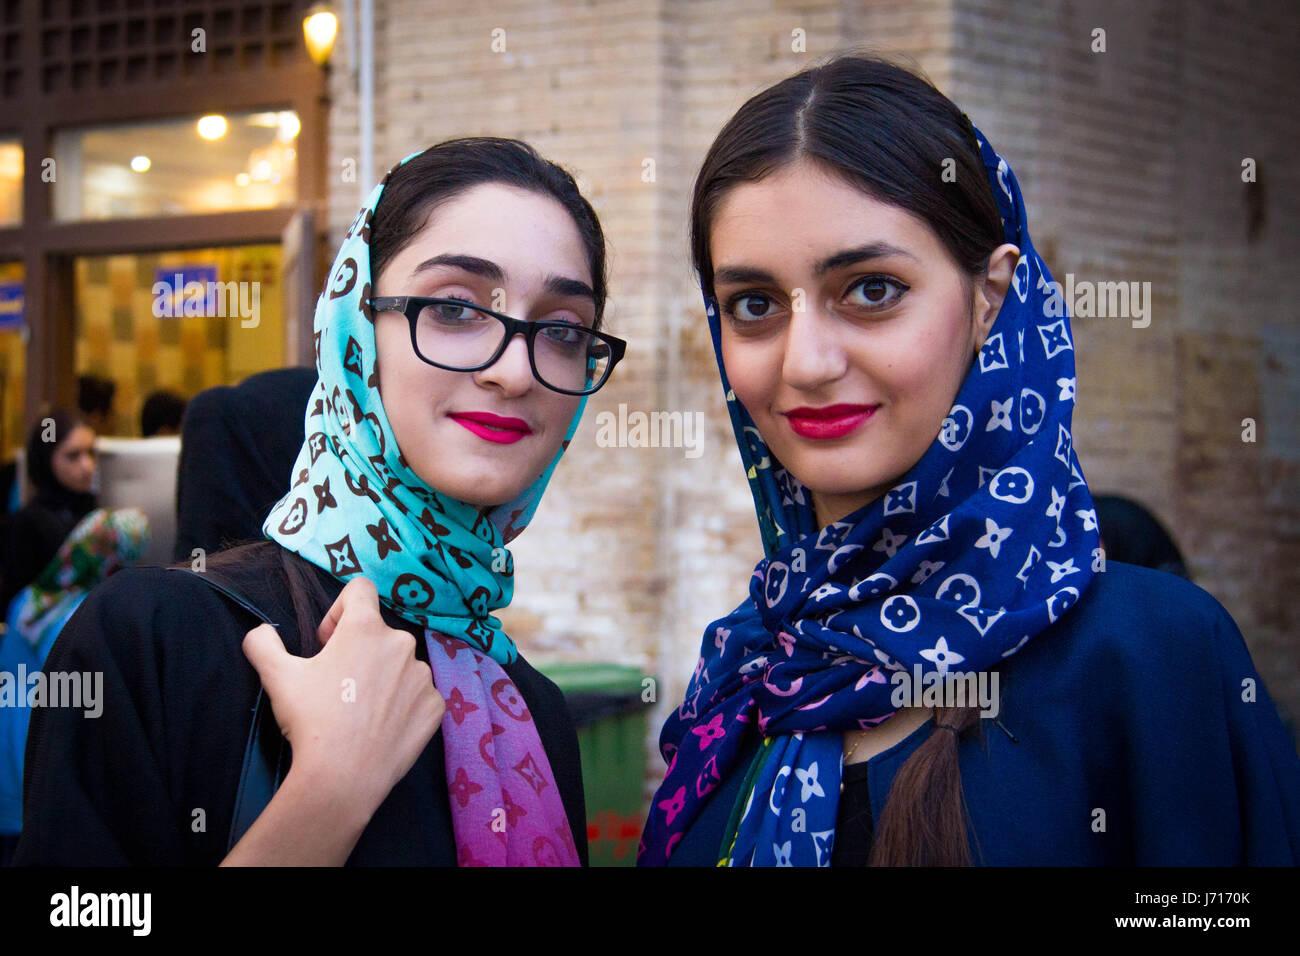 Friends Naghsh-i Jahan Square, Esfahan, Iran - Stock Image